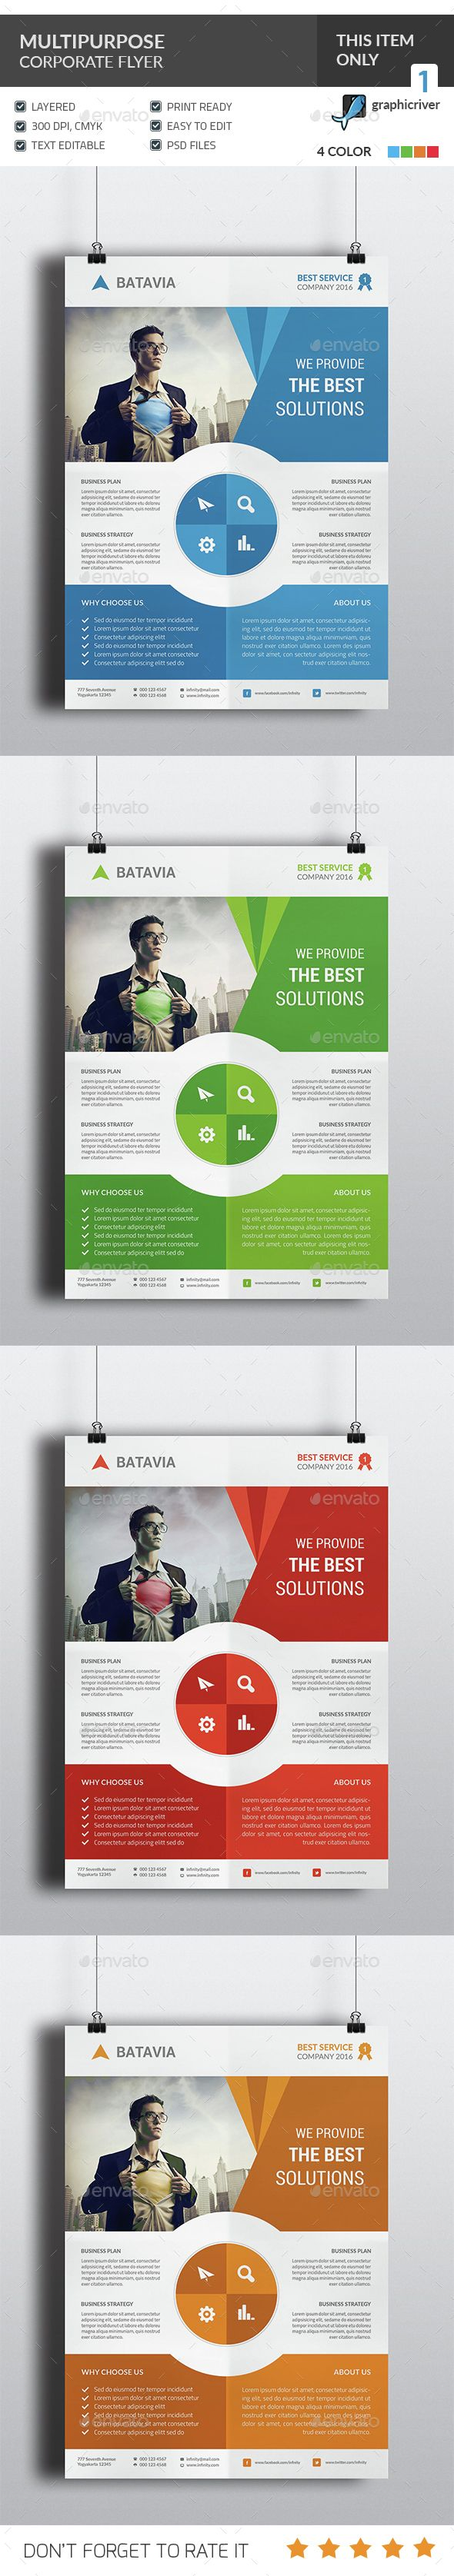 Multipurpose Corporate Flyer Template PSD. Download here: http://graphicriver.net/item/multipurpose-corporate-flyer/15232907?ref=ksioks